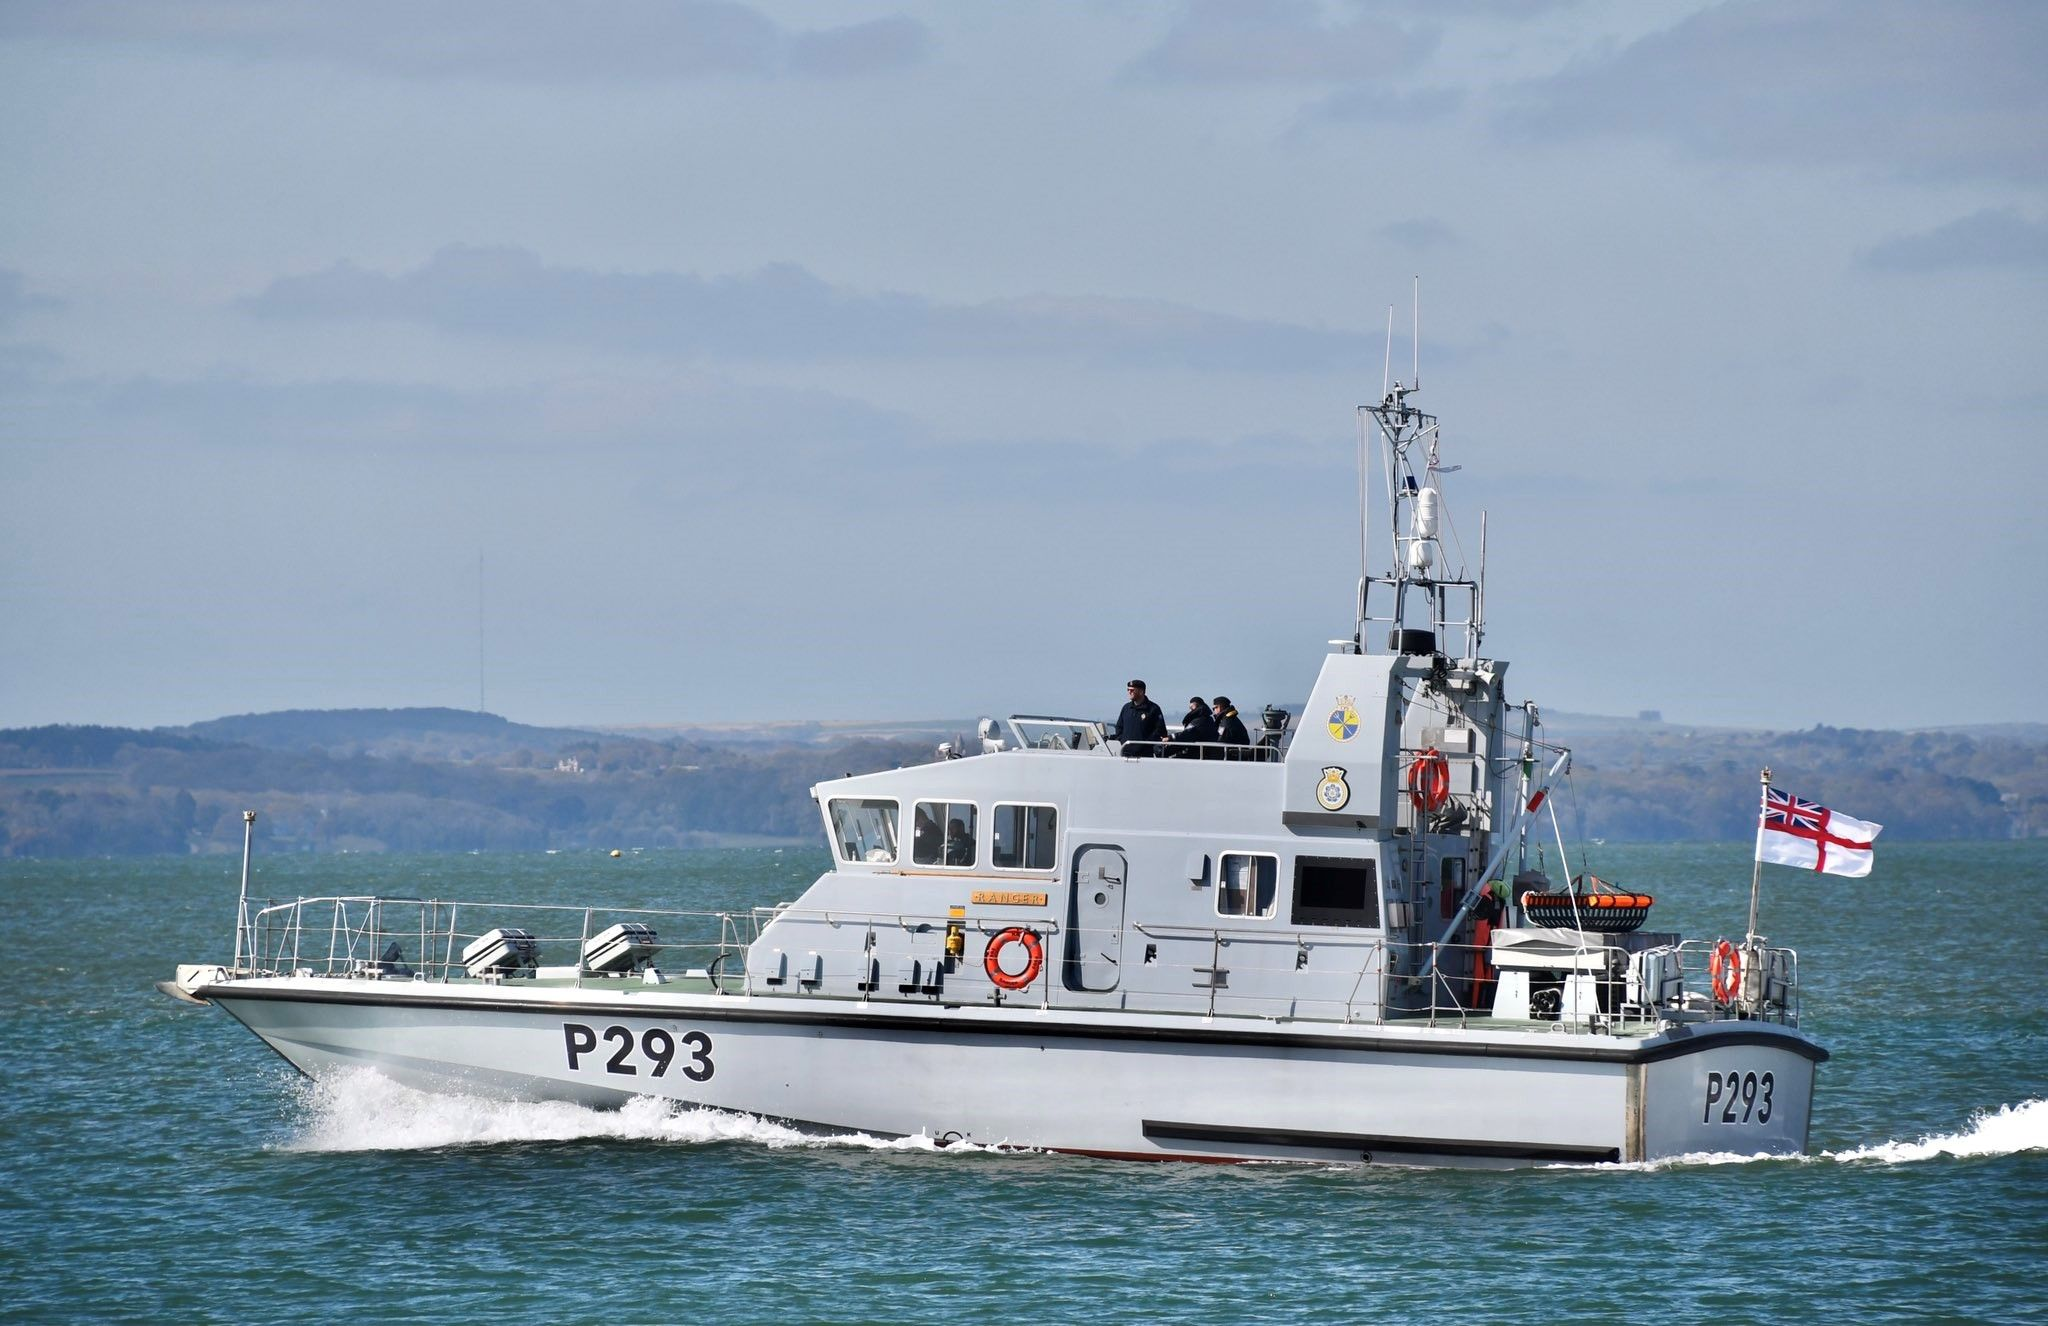 HMS RANGER